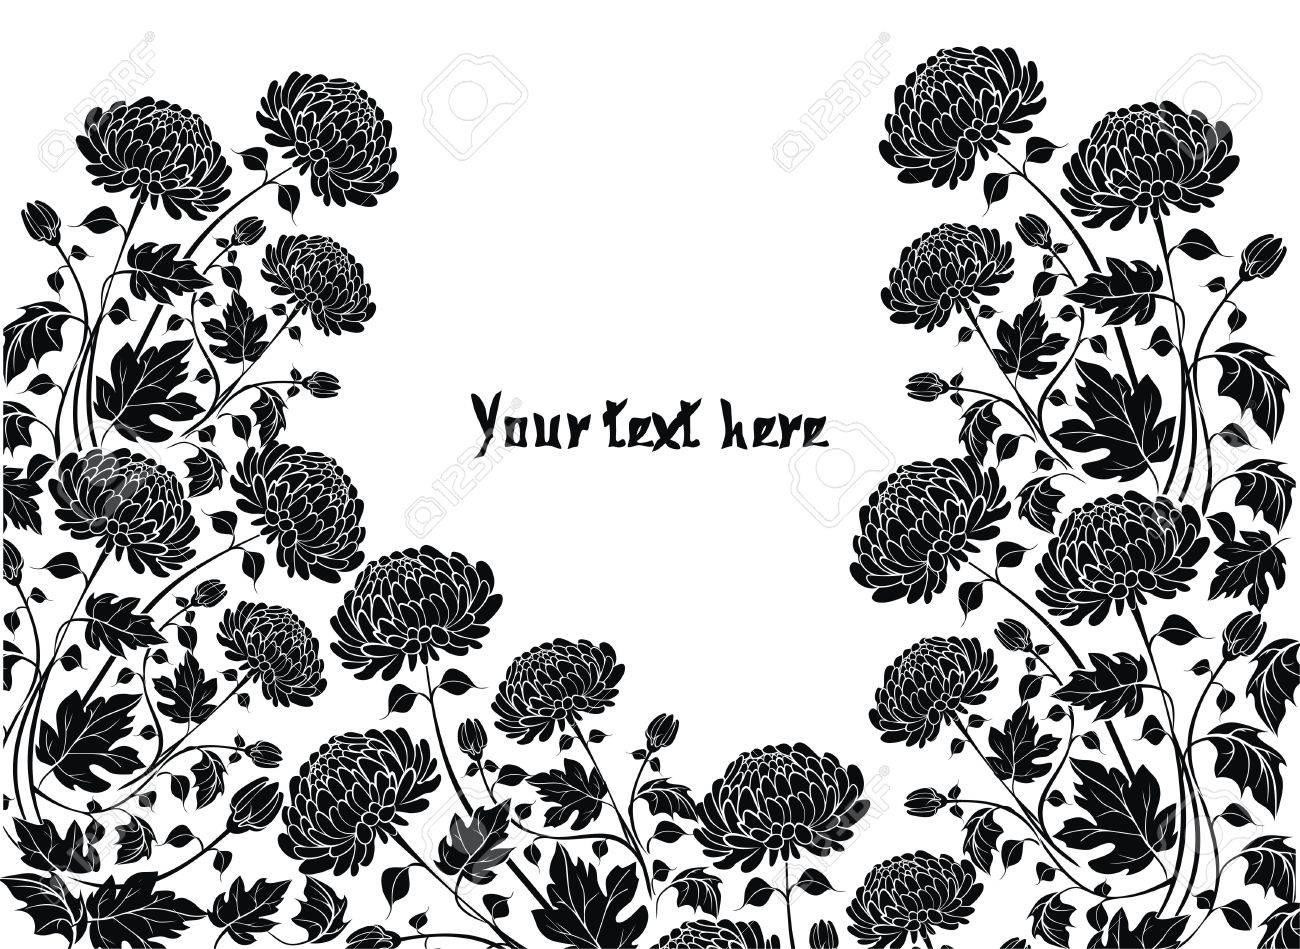 Elegant  flower background with chrysanthemums Stock Vector - 21744936